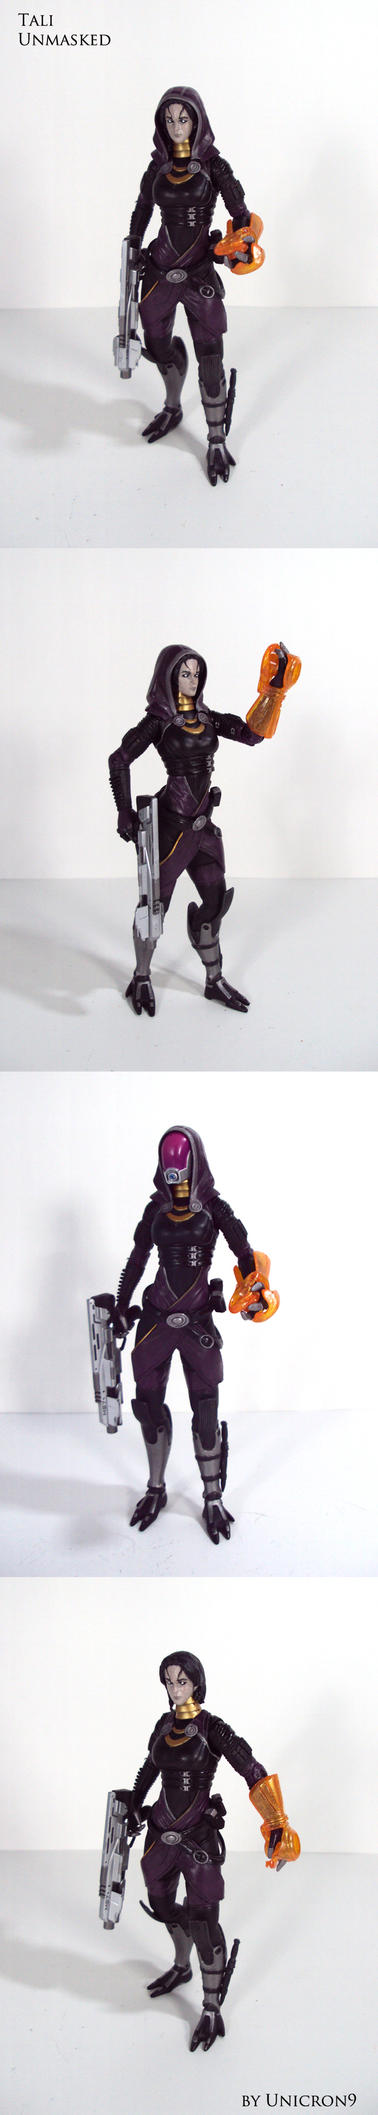 Mass Effect Tali Unmasked by Unicron9 on DeviantArt